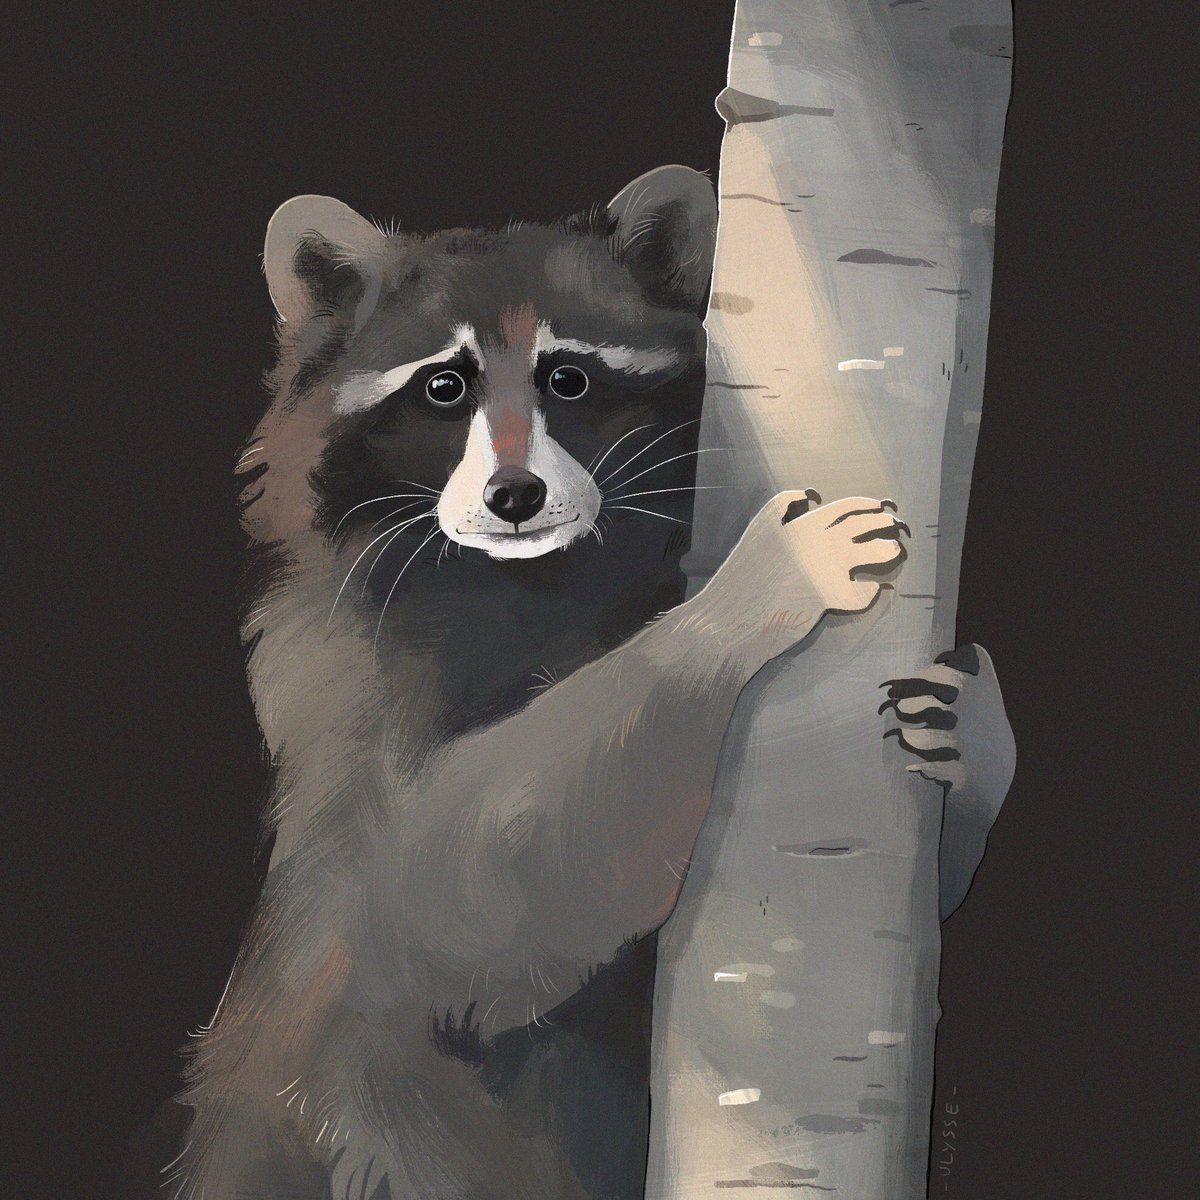 Raccoon.  #study #art #digitalpaintingpic.twitter.com/ICefKpxr54